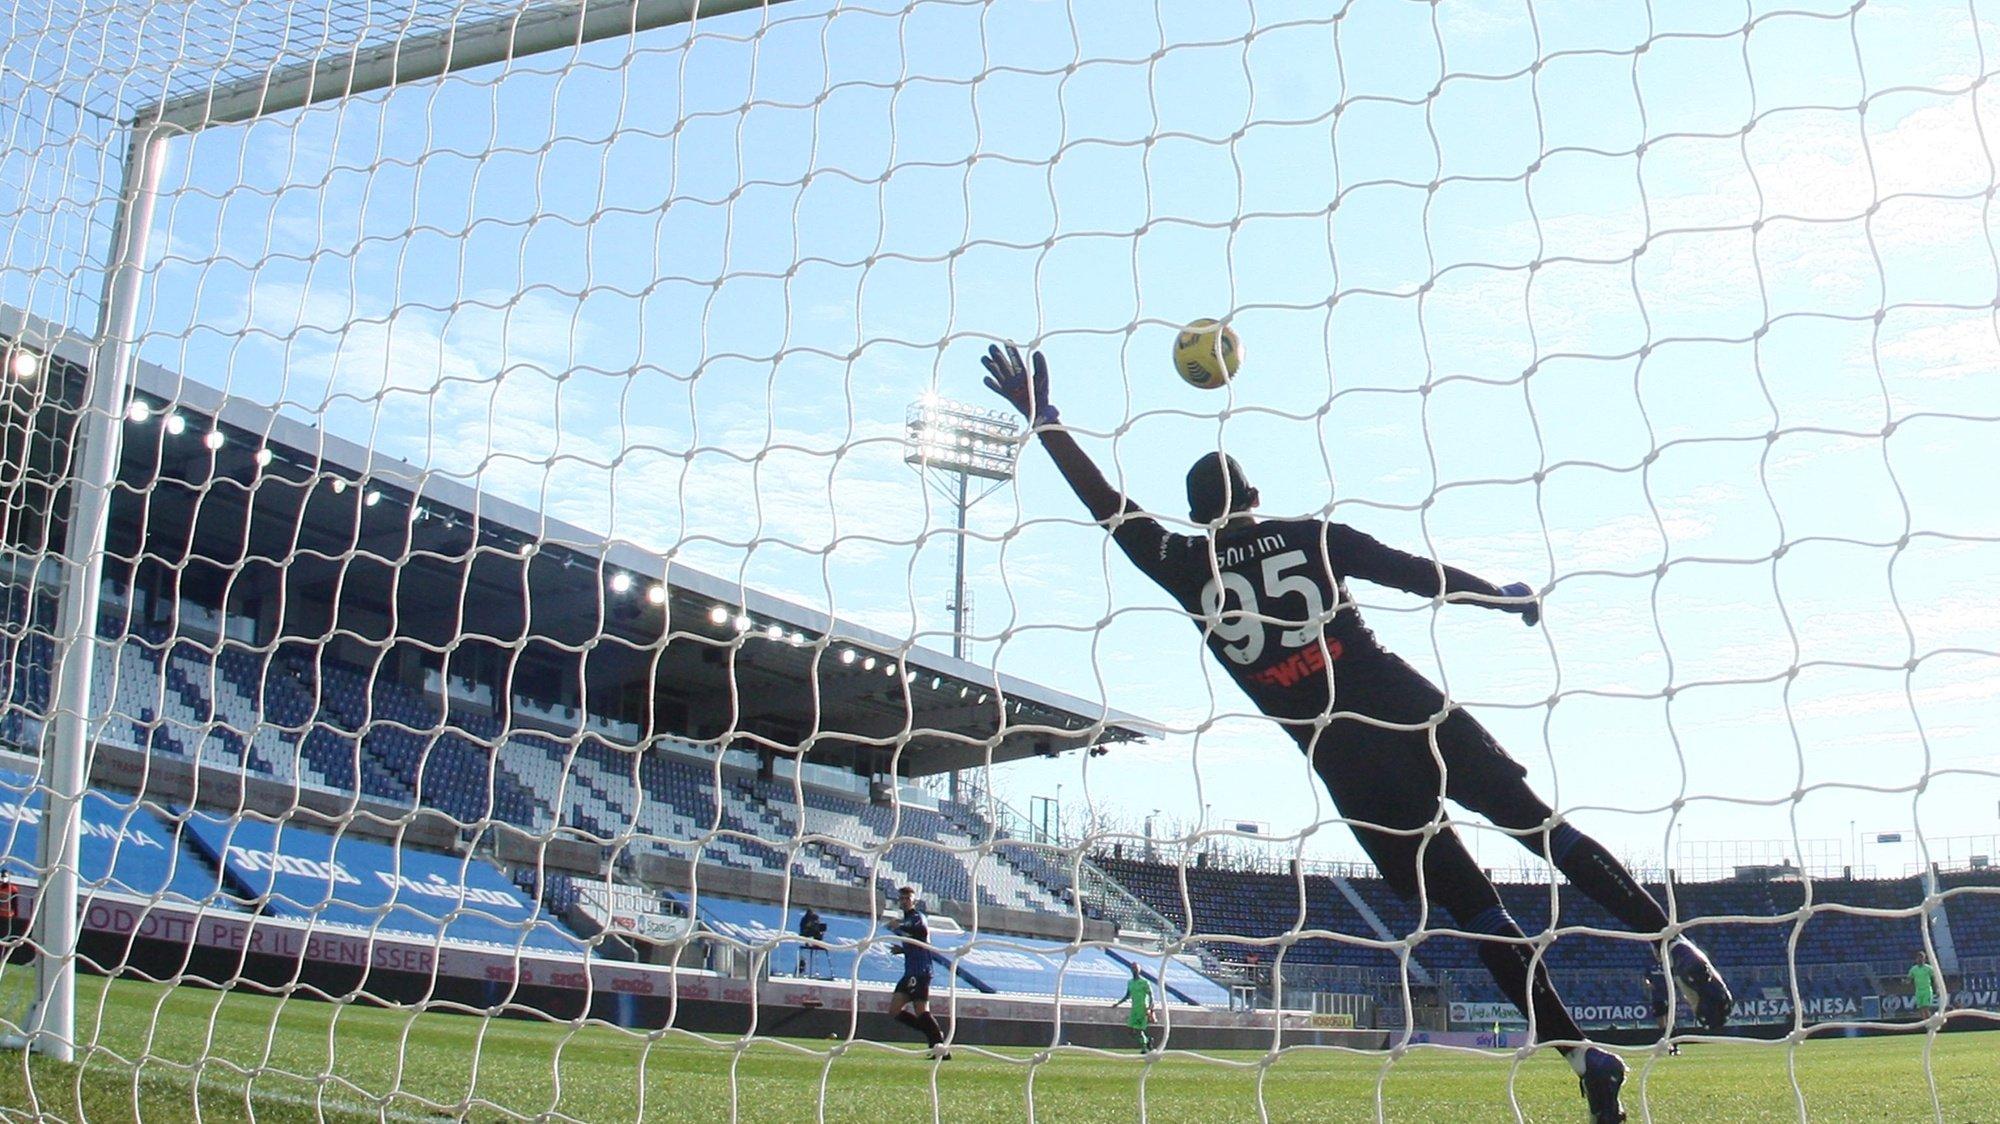 epa08977668 Atalanta's goalkeeper Pierluigi Gollini concedes Lazio's 1-0 lead during the Italian Serie A soccer match between Atalanta BC and SS Lazio in Bergamo, Italy, 31 January 2021.  EPA/PAOLO MAGNI